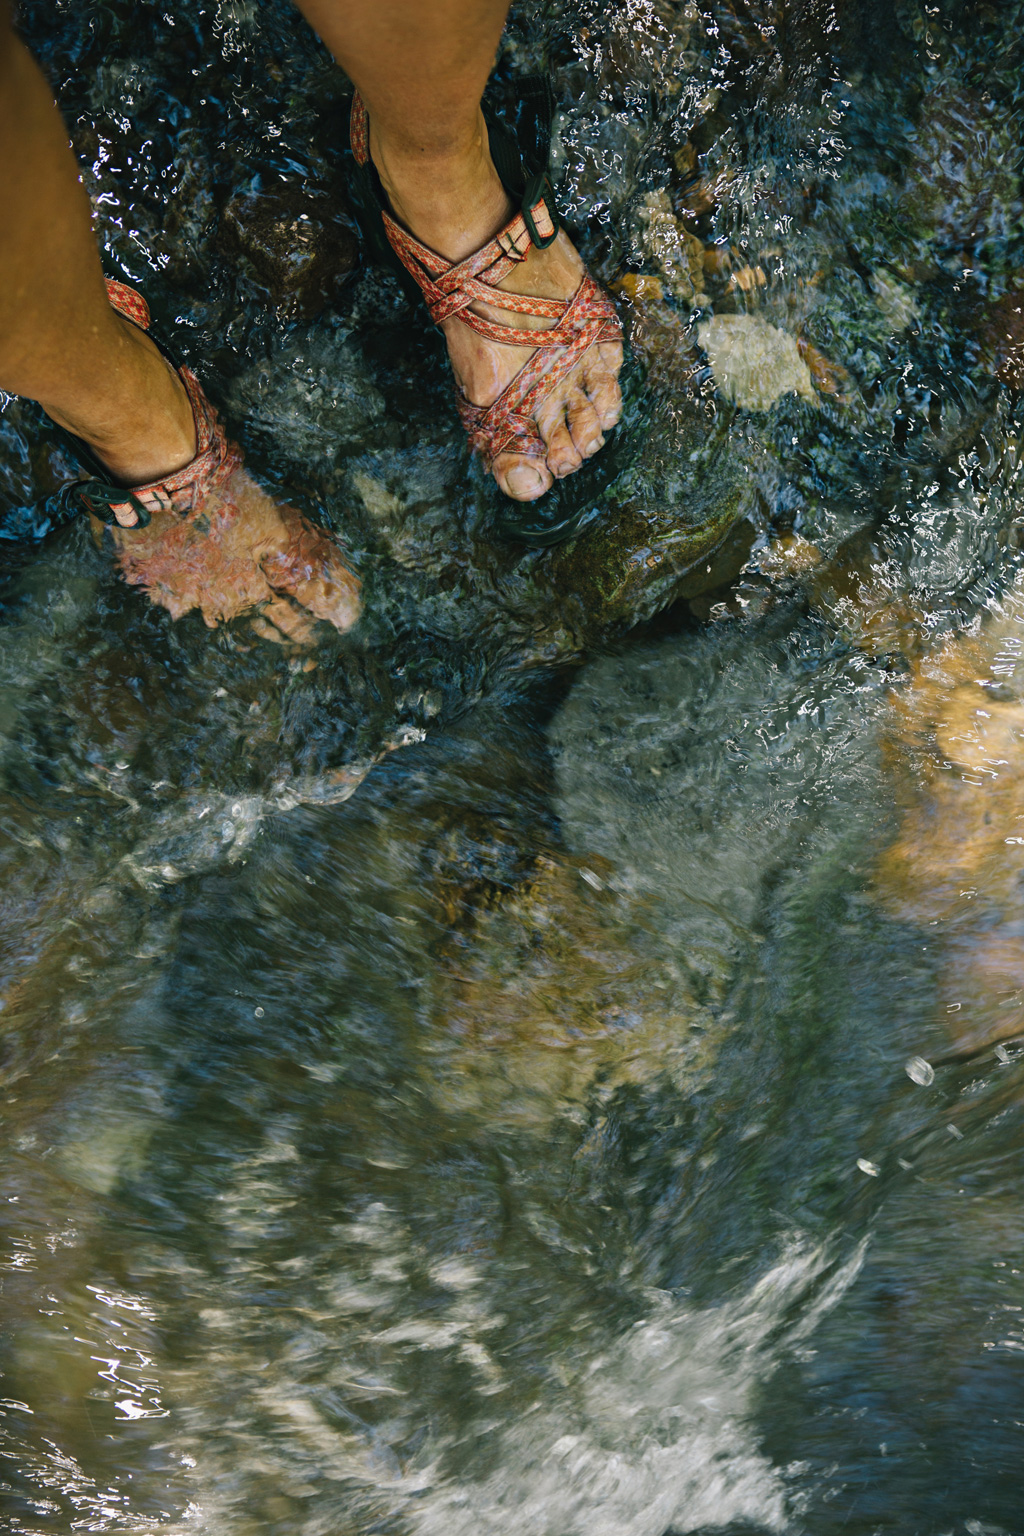 CindyGiovagnoli_Galena_Creek_Visitors_Center_hike_Reno_Tahoe_Nevada_outdoor_activities-010.jpg